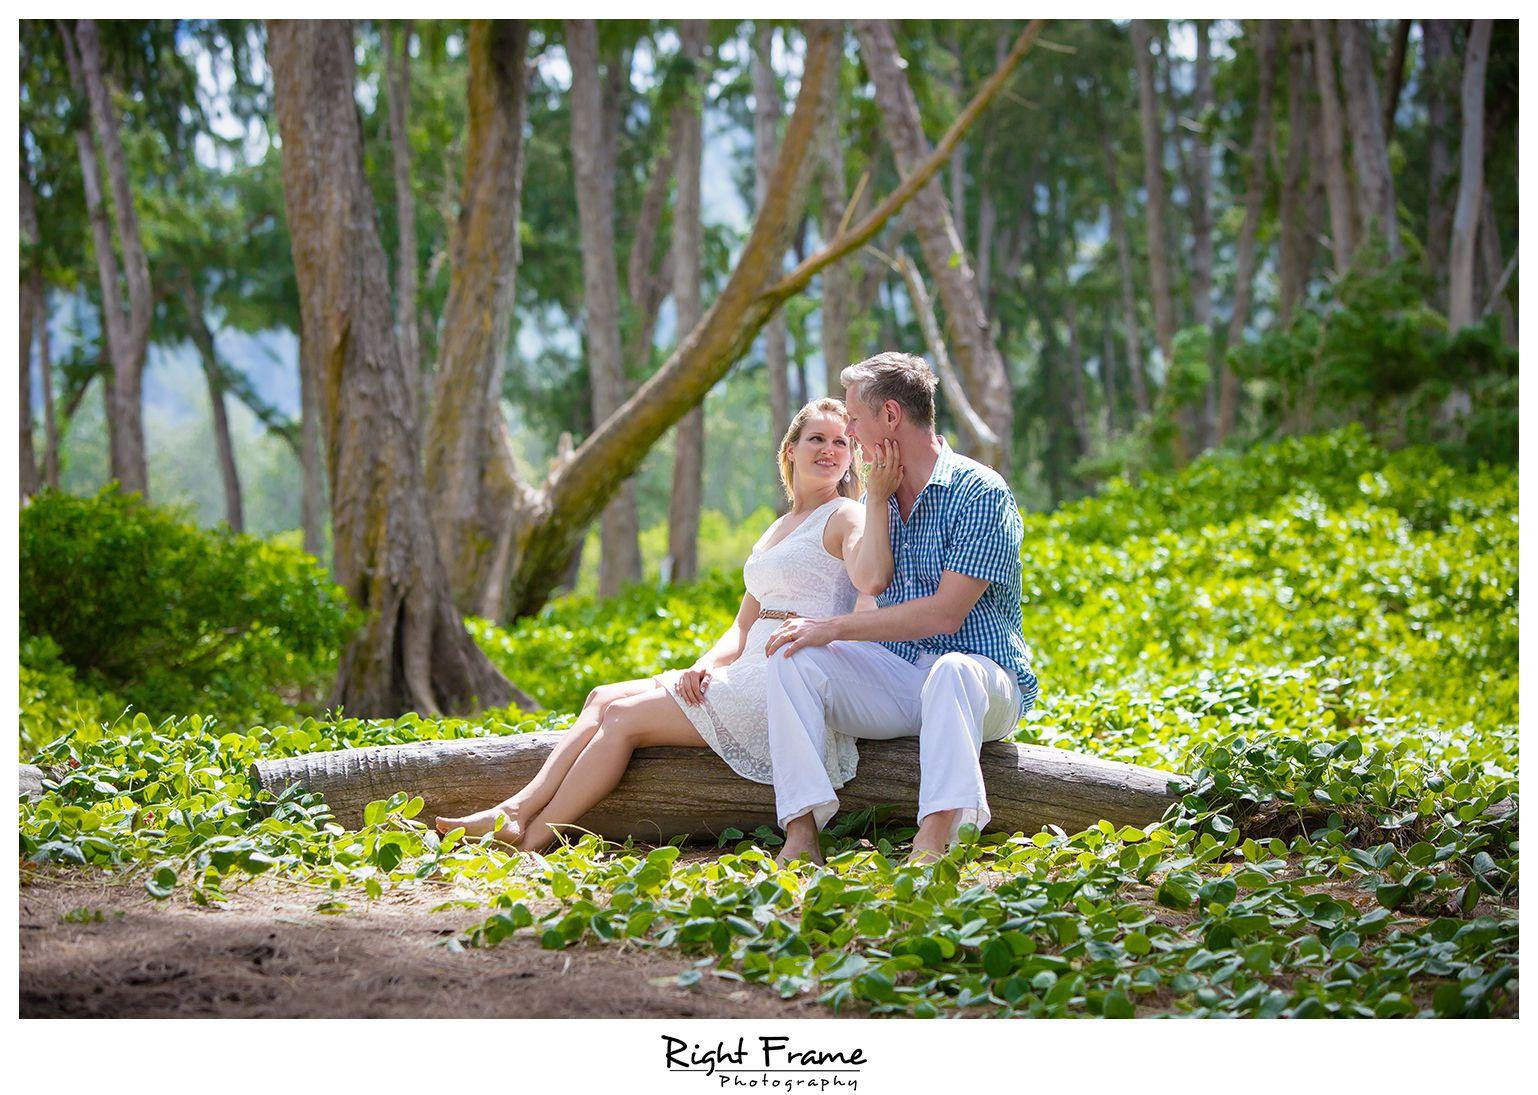 099_oahu couples photography